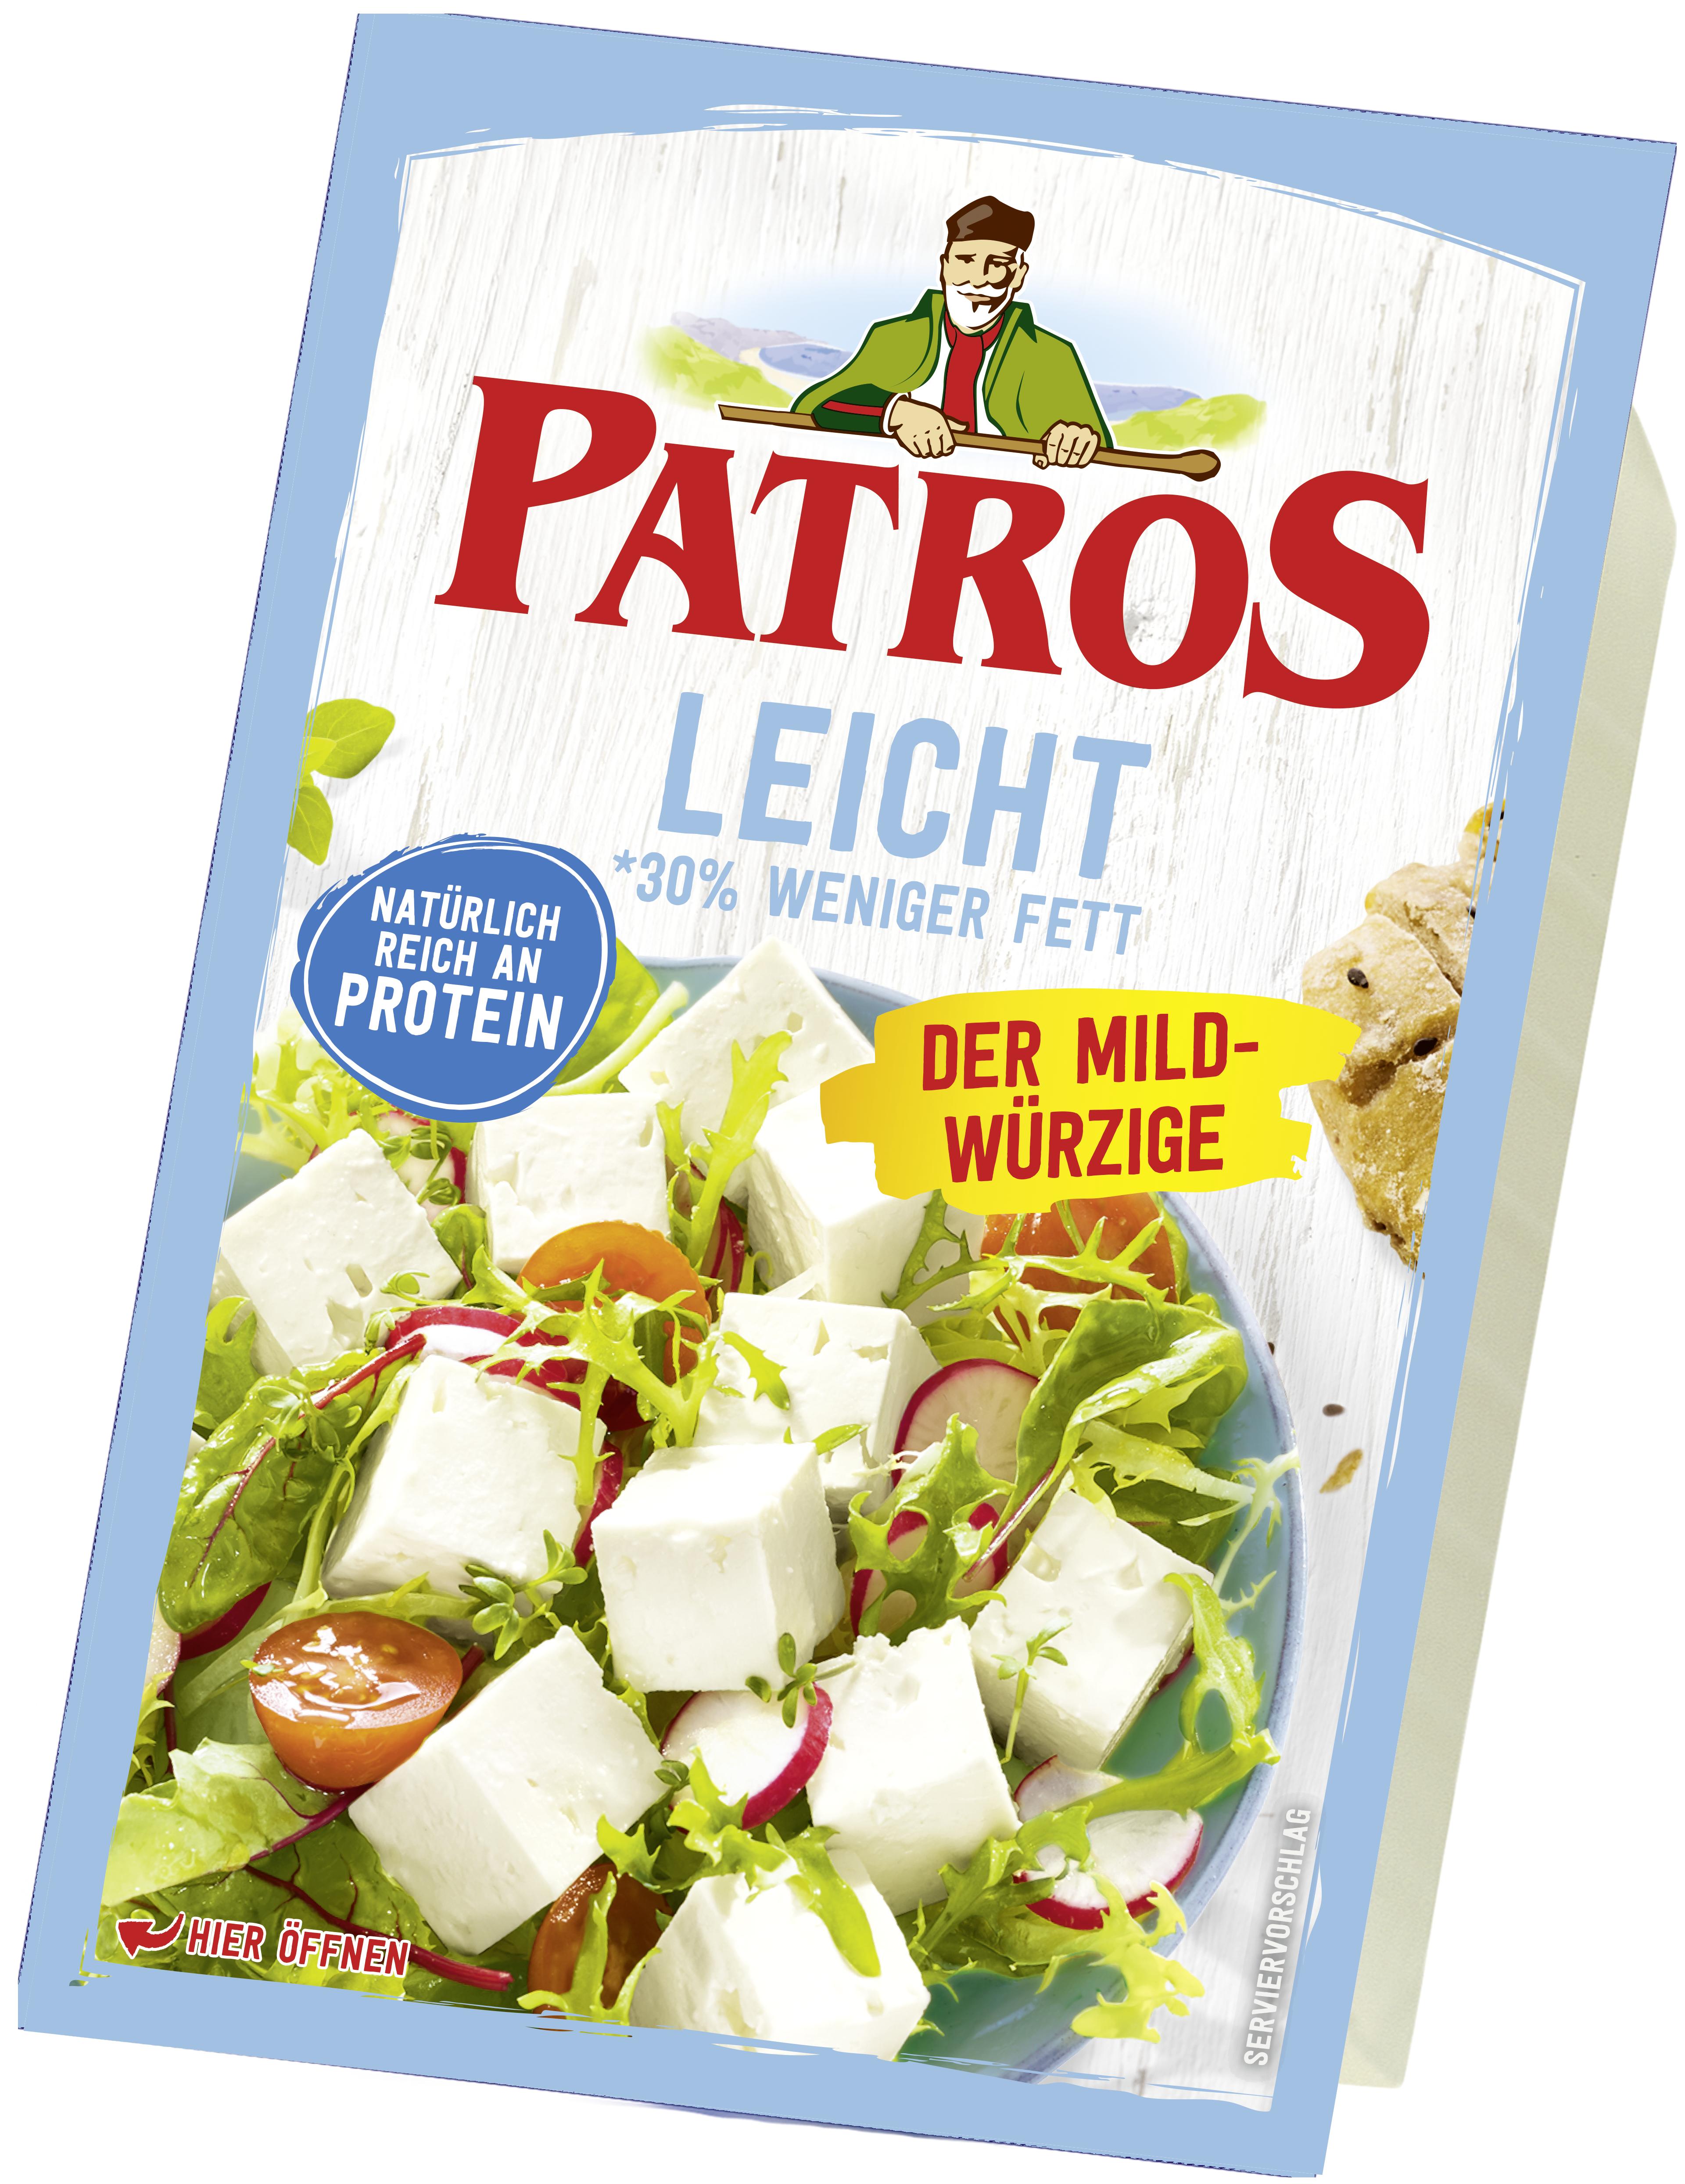 PATROS_Leicht_Packshot